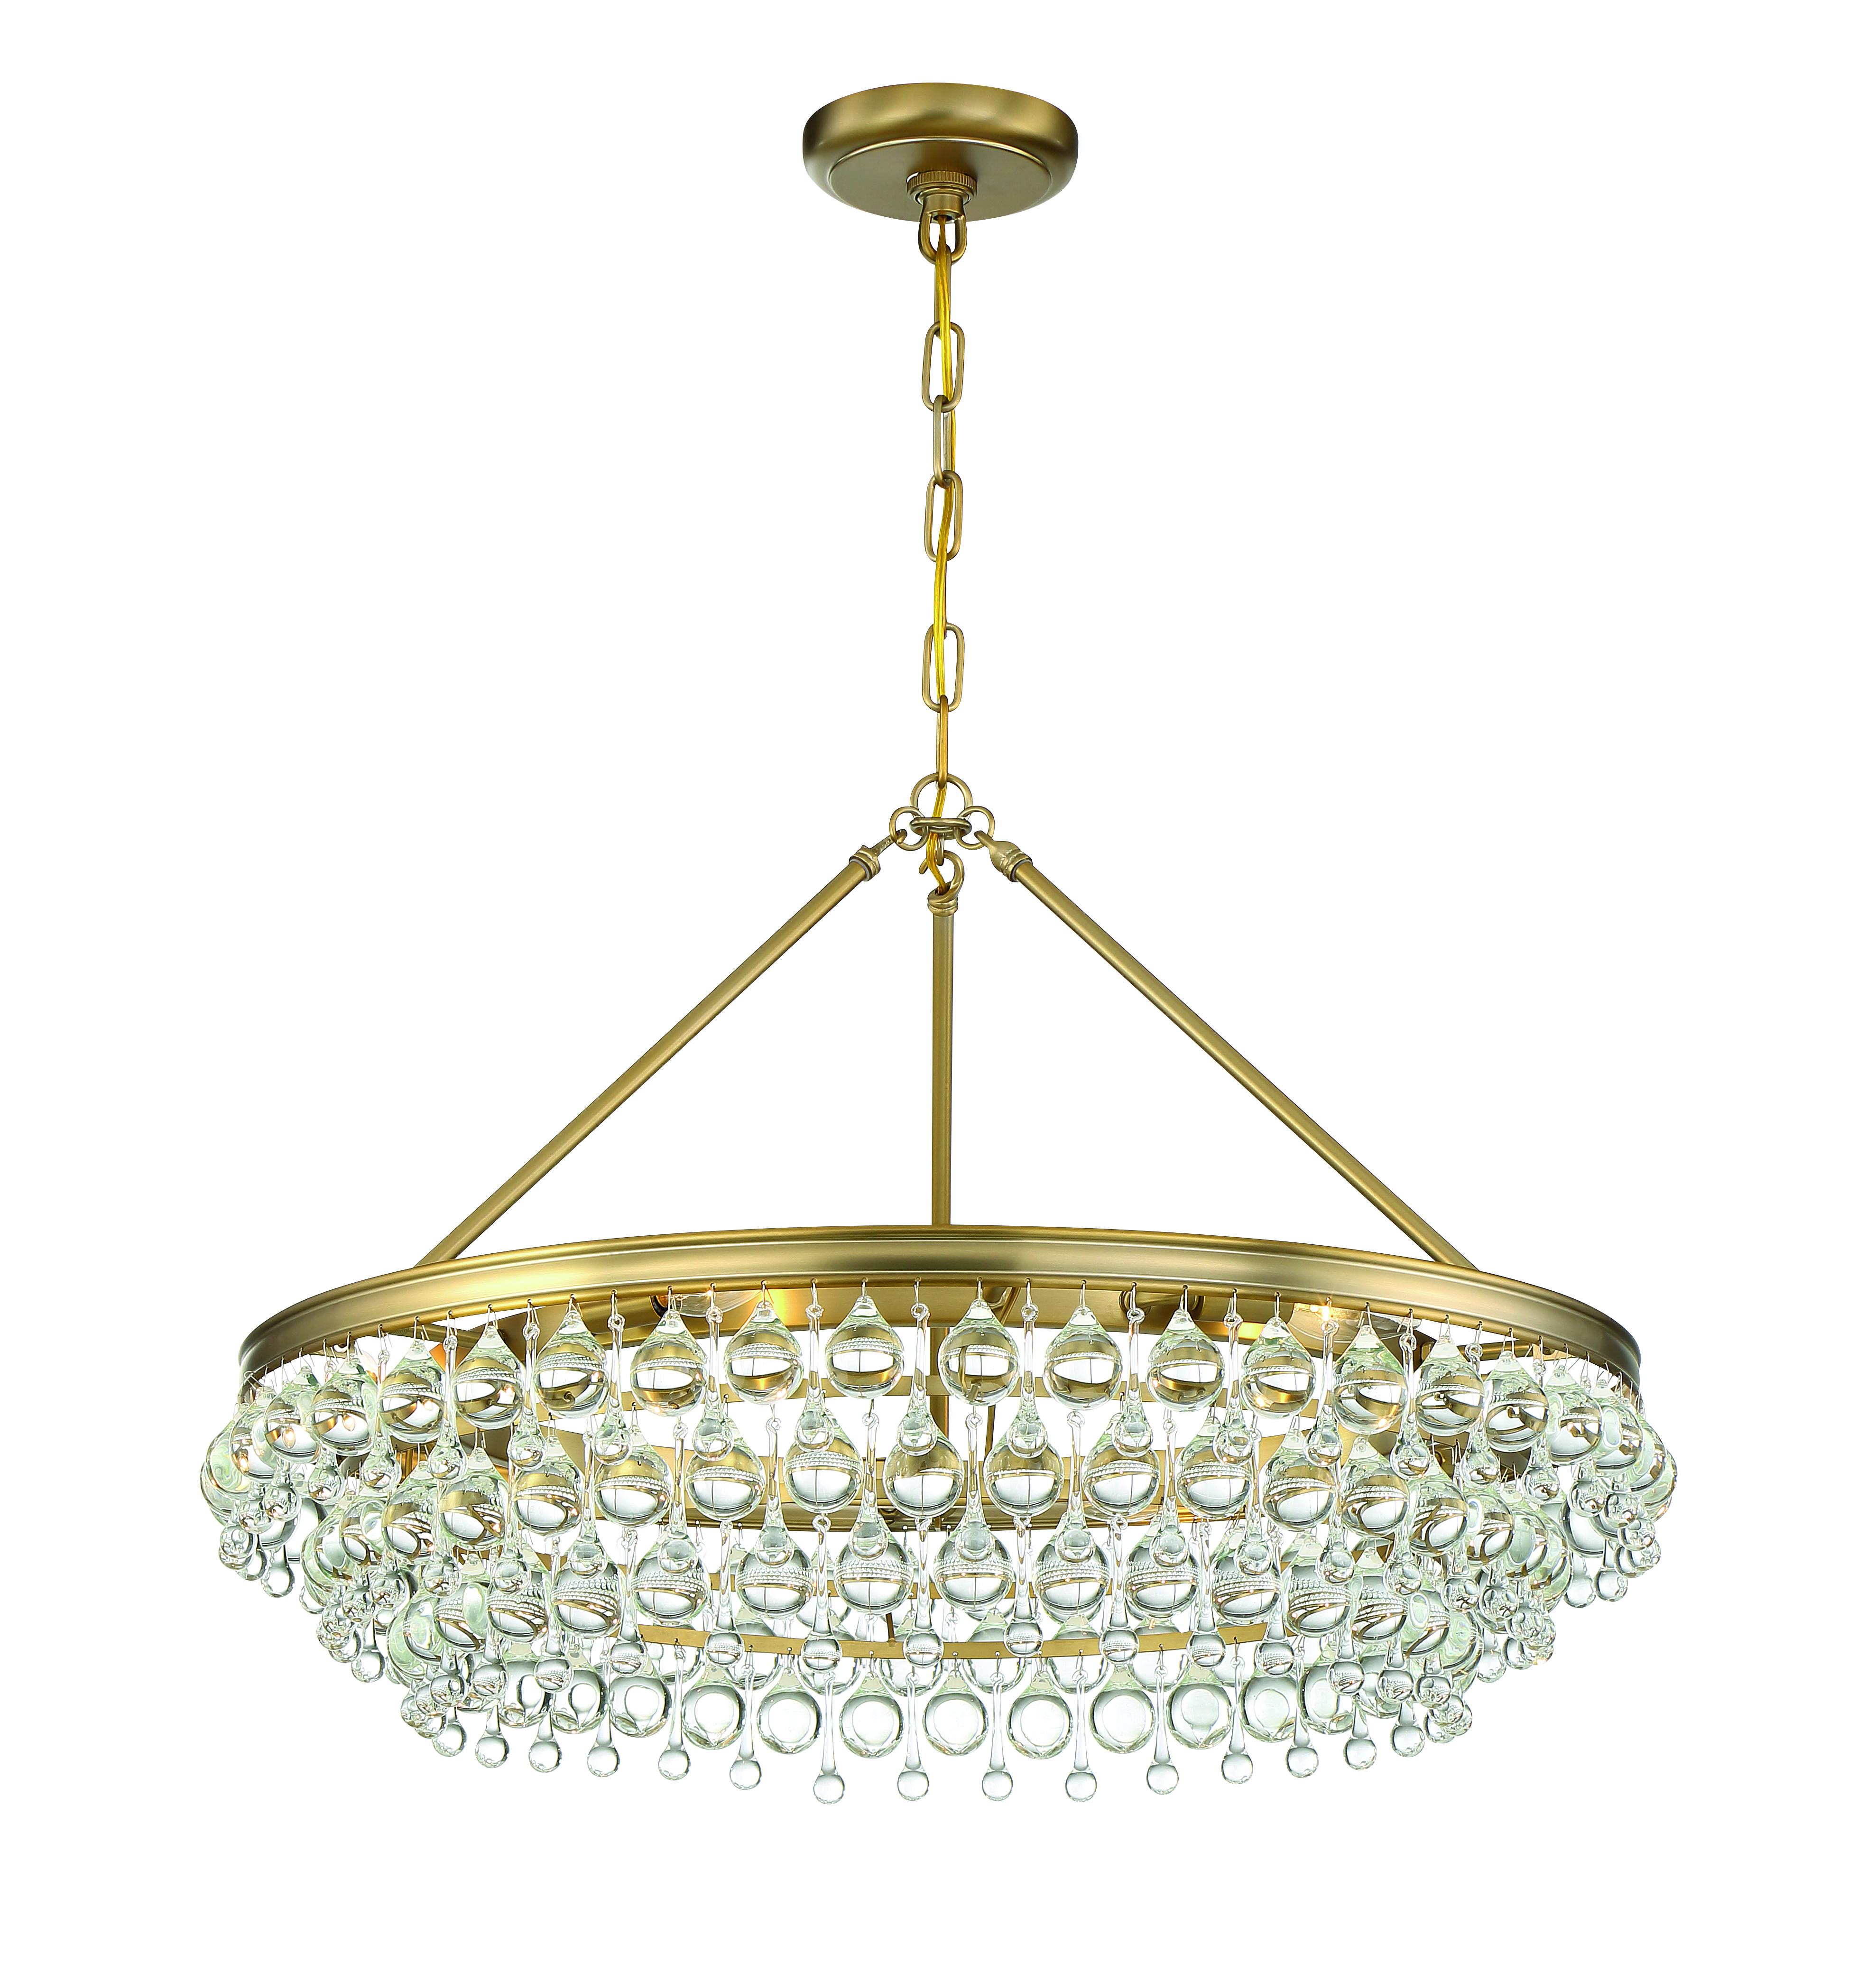 Crystorama Calypso Collection chandelier